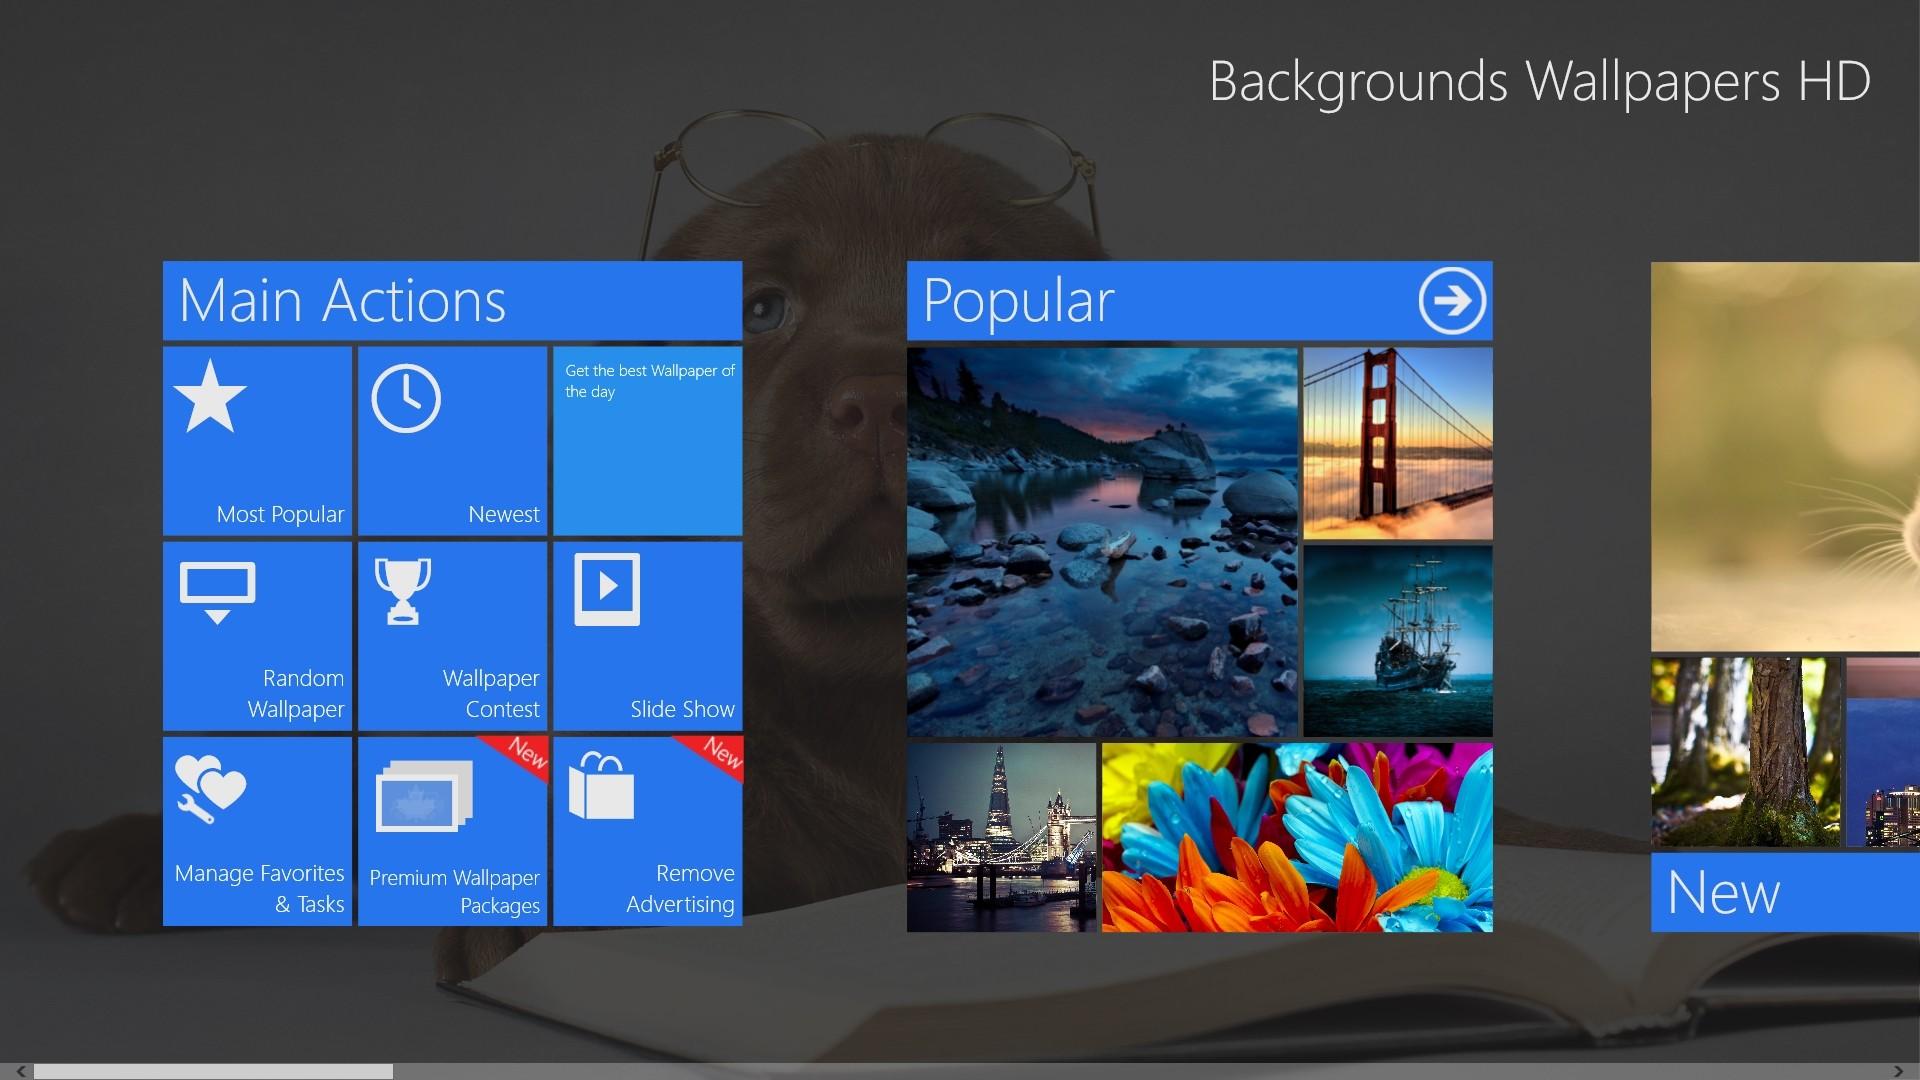 Desktop Background: Background Wallpaper Hd App